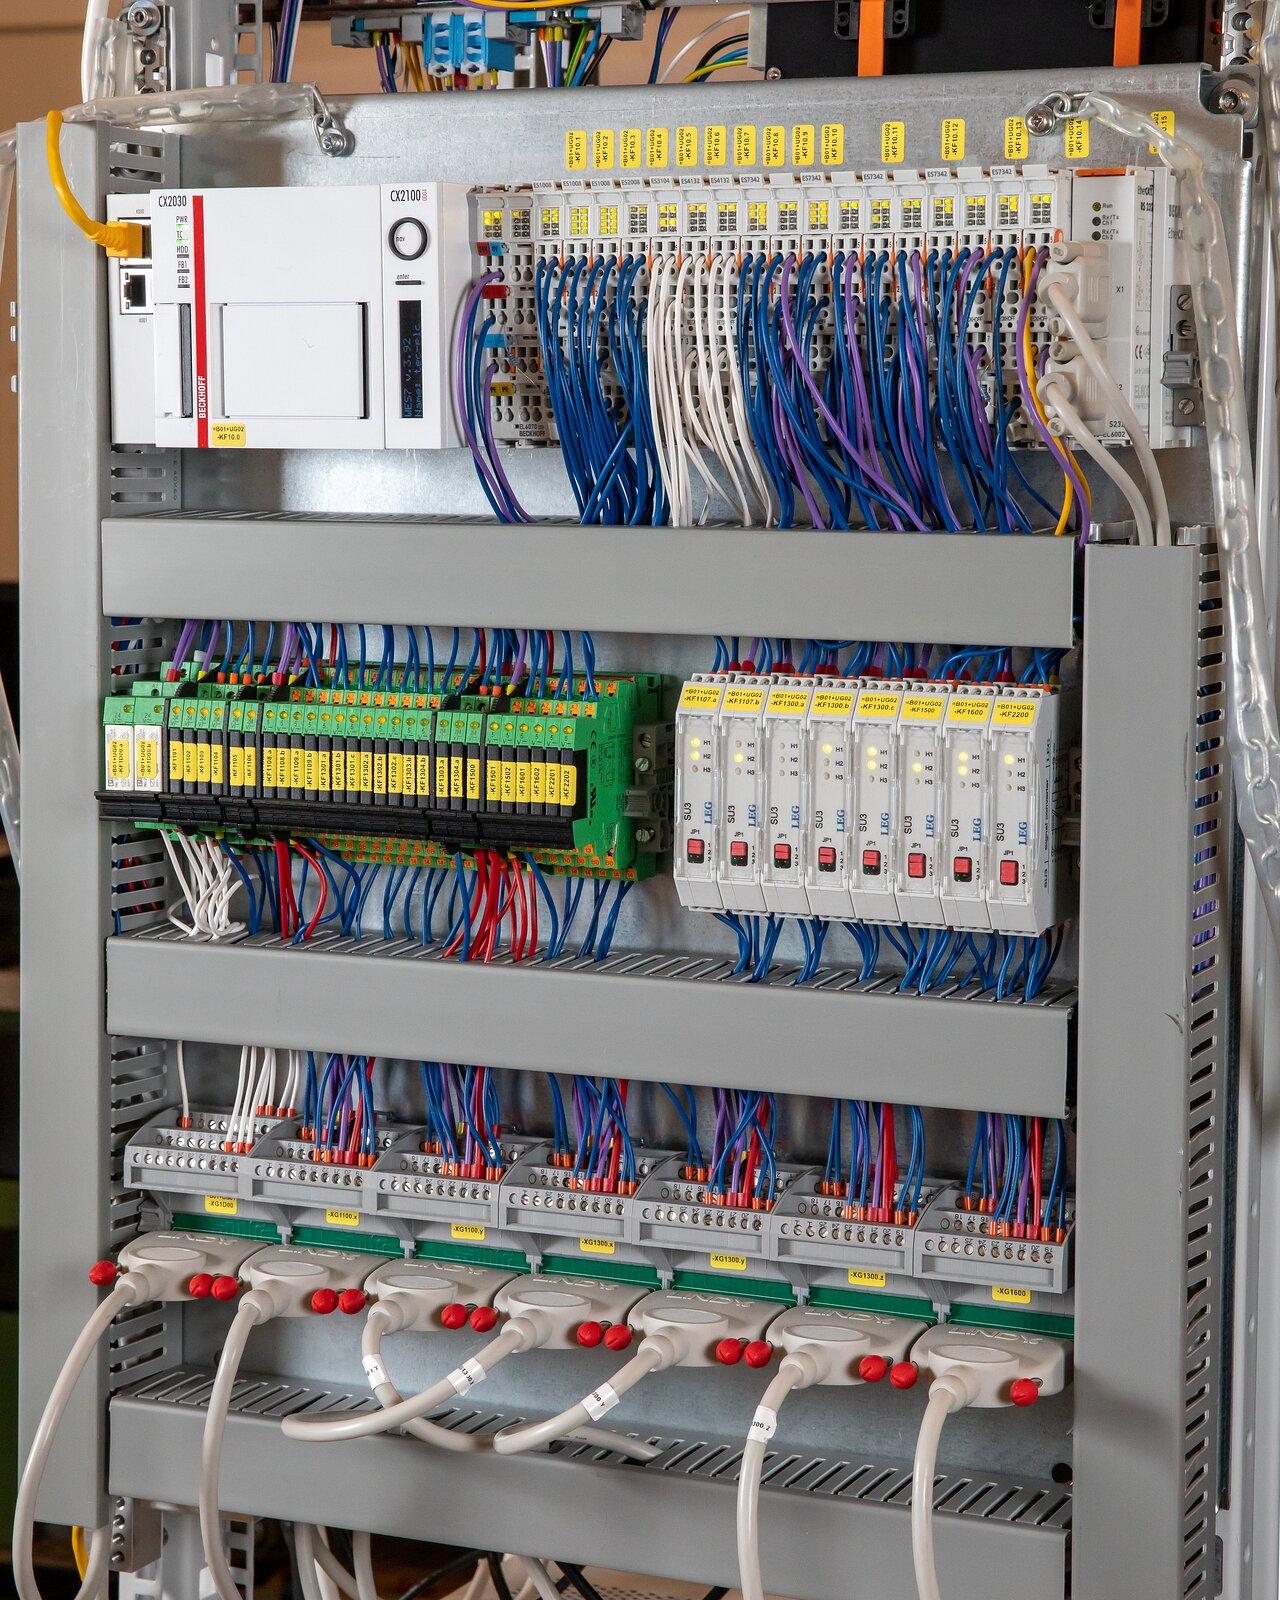 MELT control modules